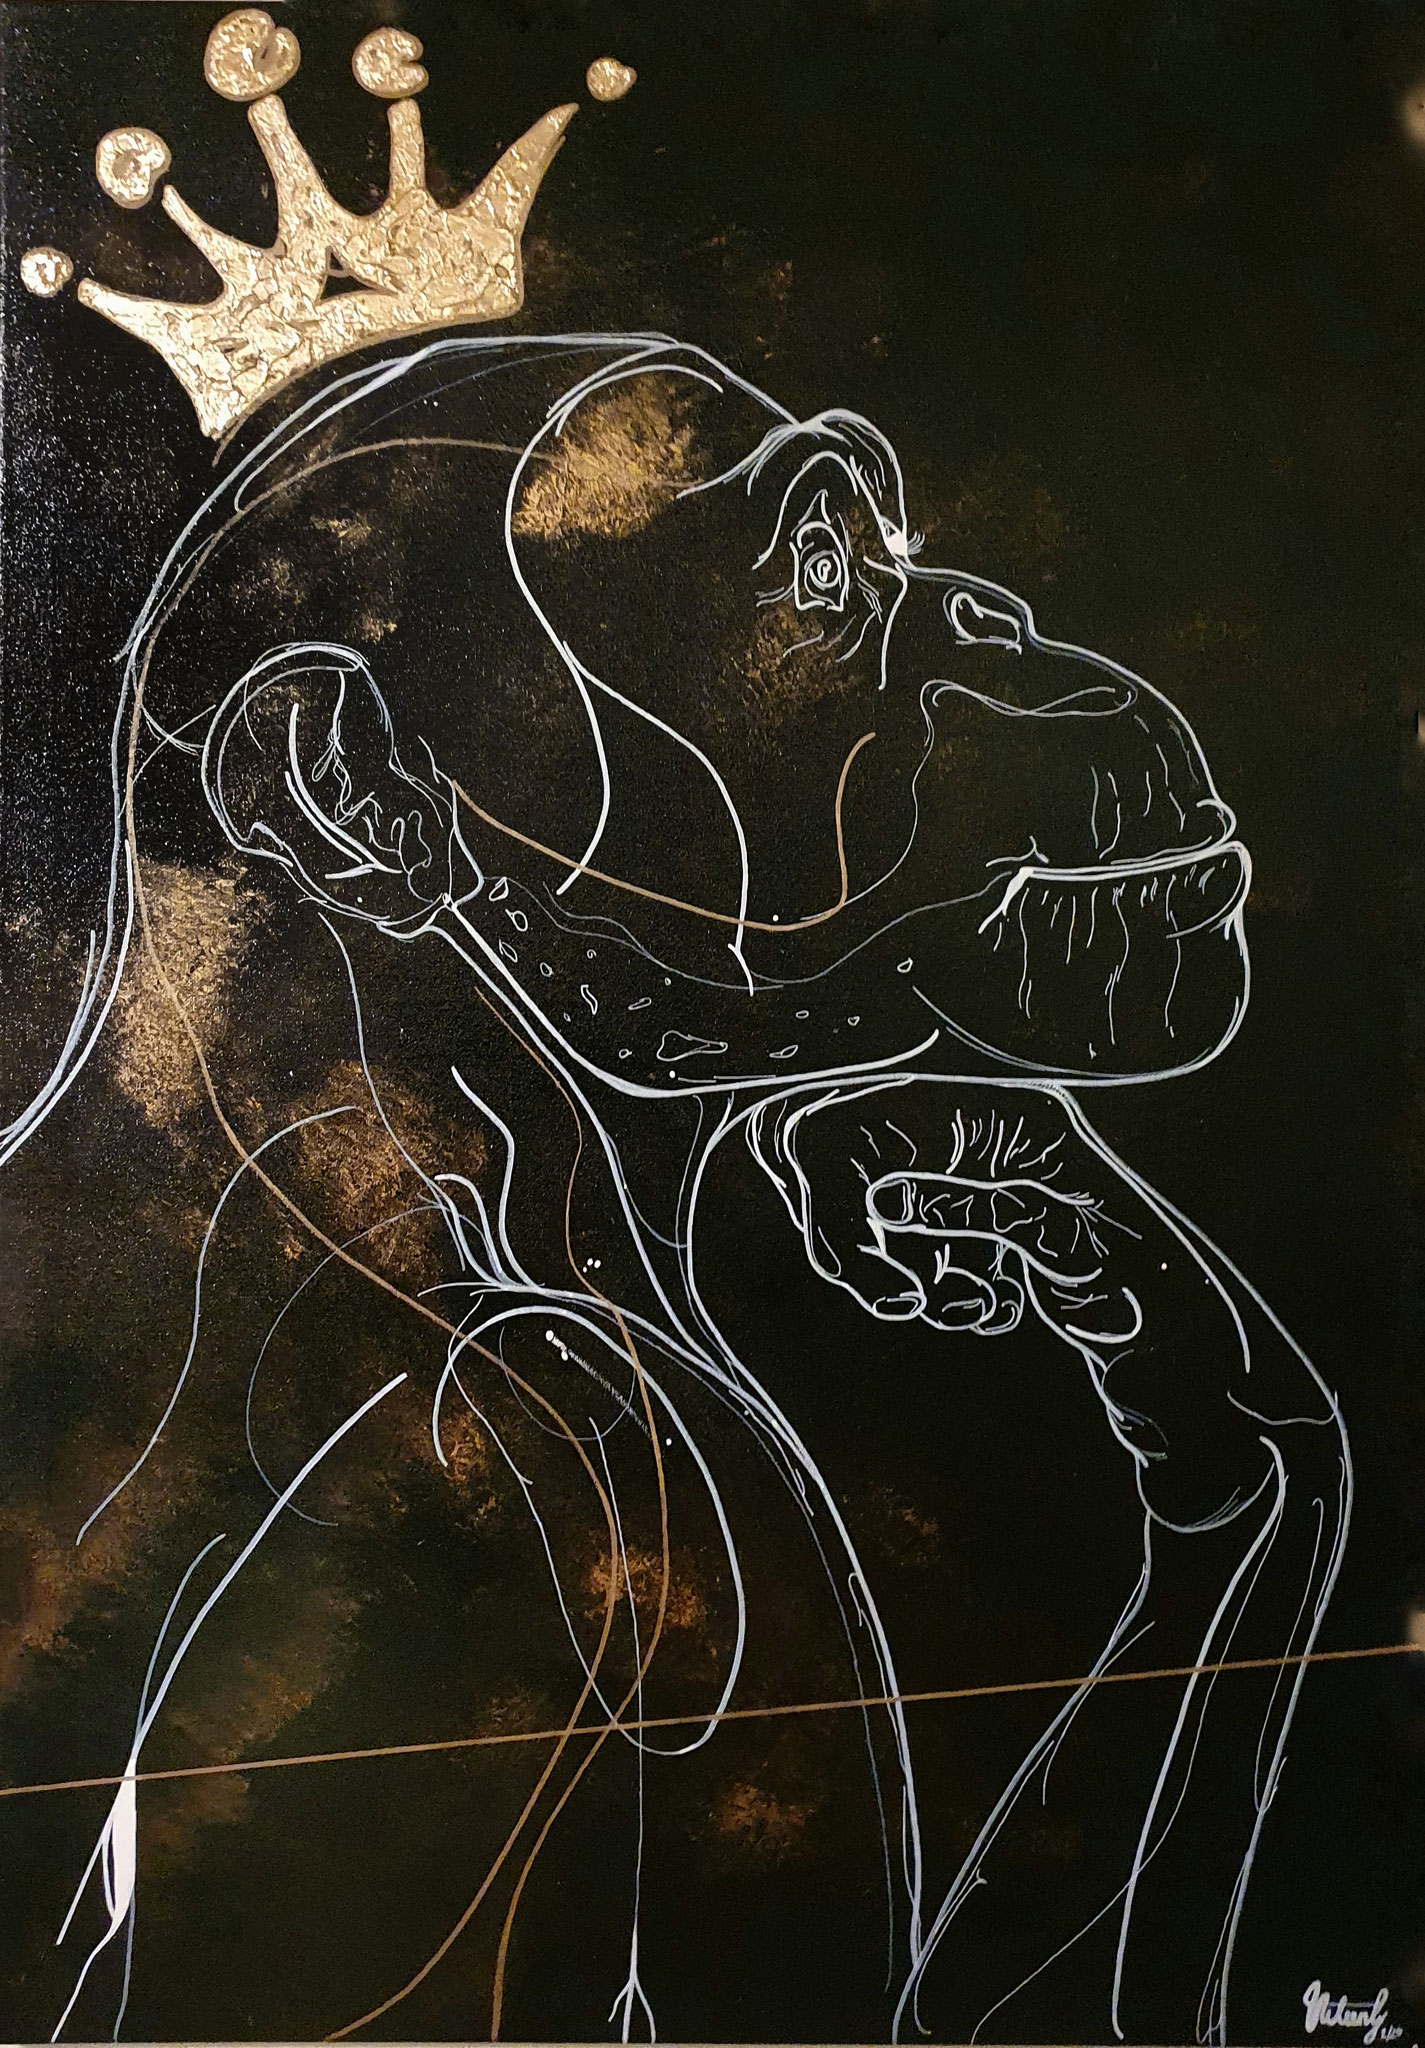 secret thoughts, 100x70cm, 2020, Acryl und Blattgold auf Leinwand